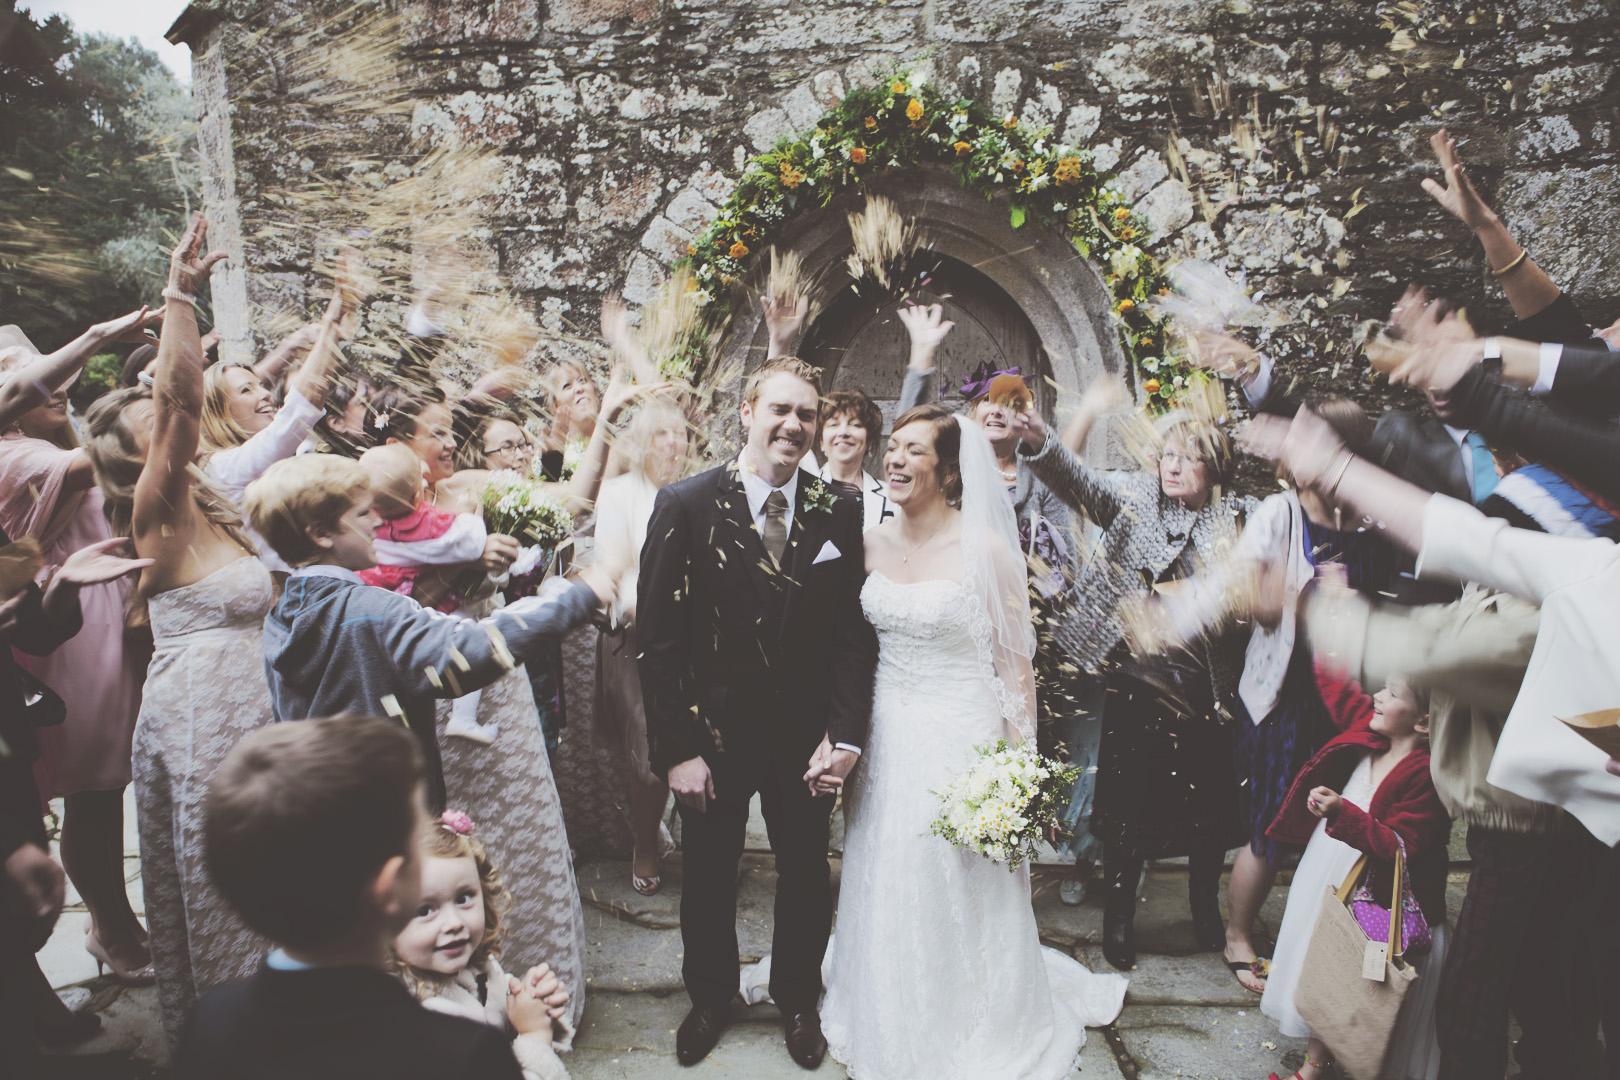 wedding_280913_5291